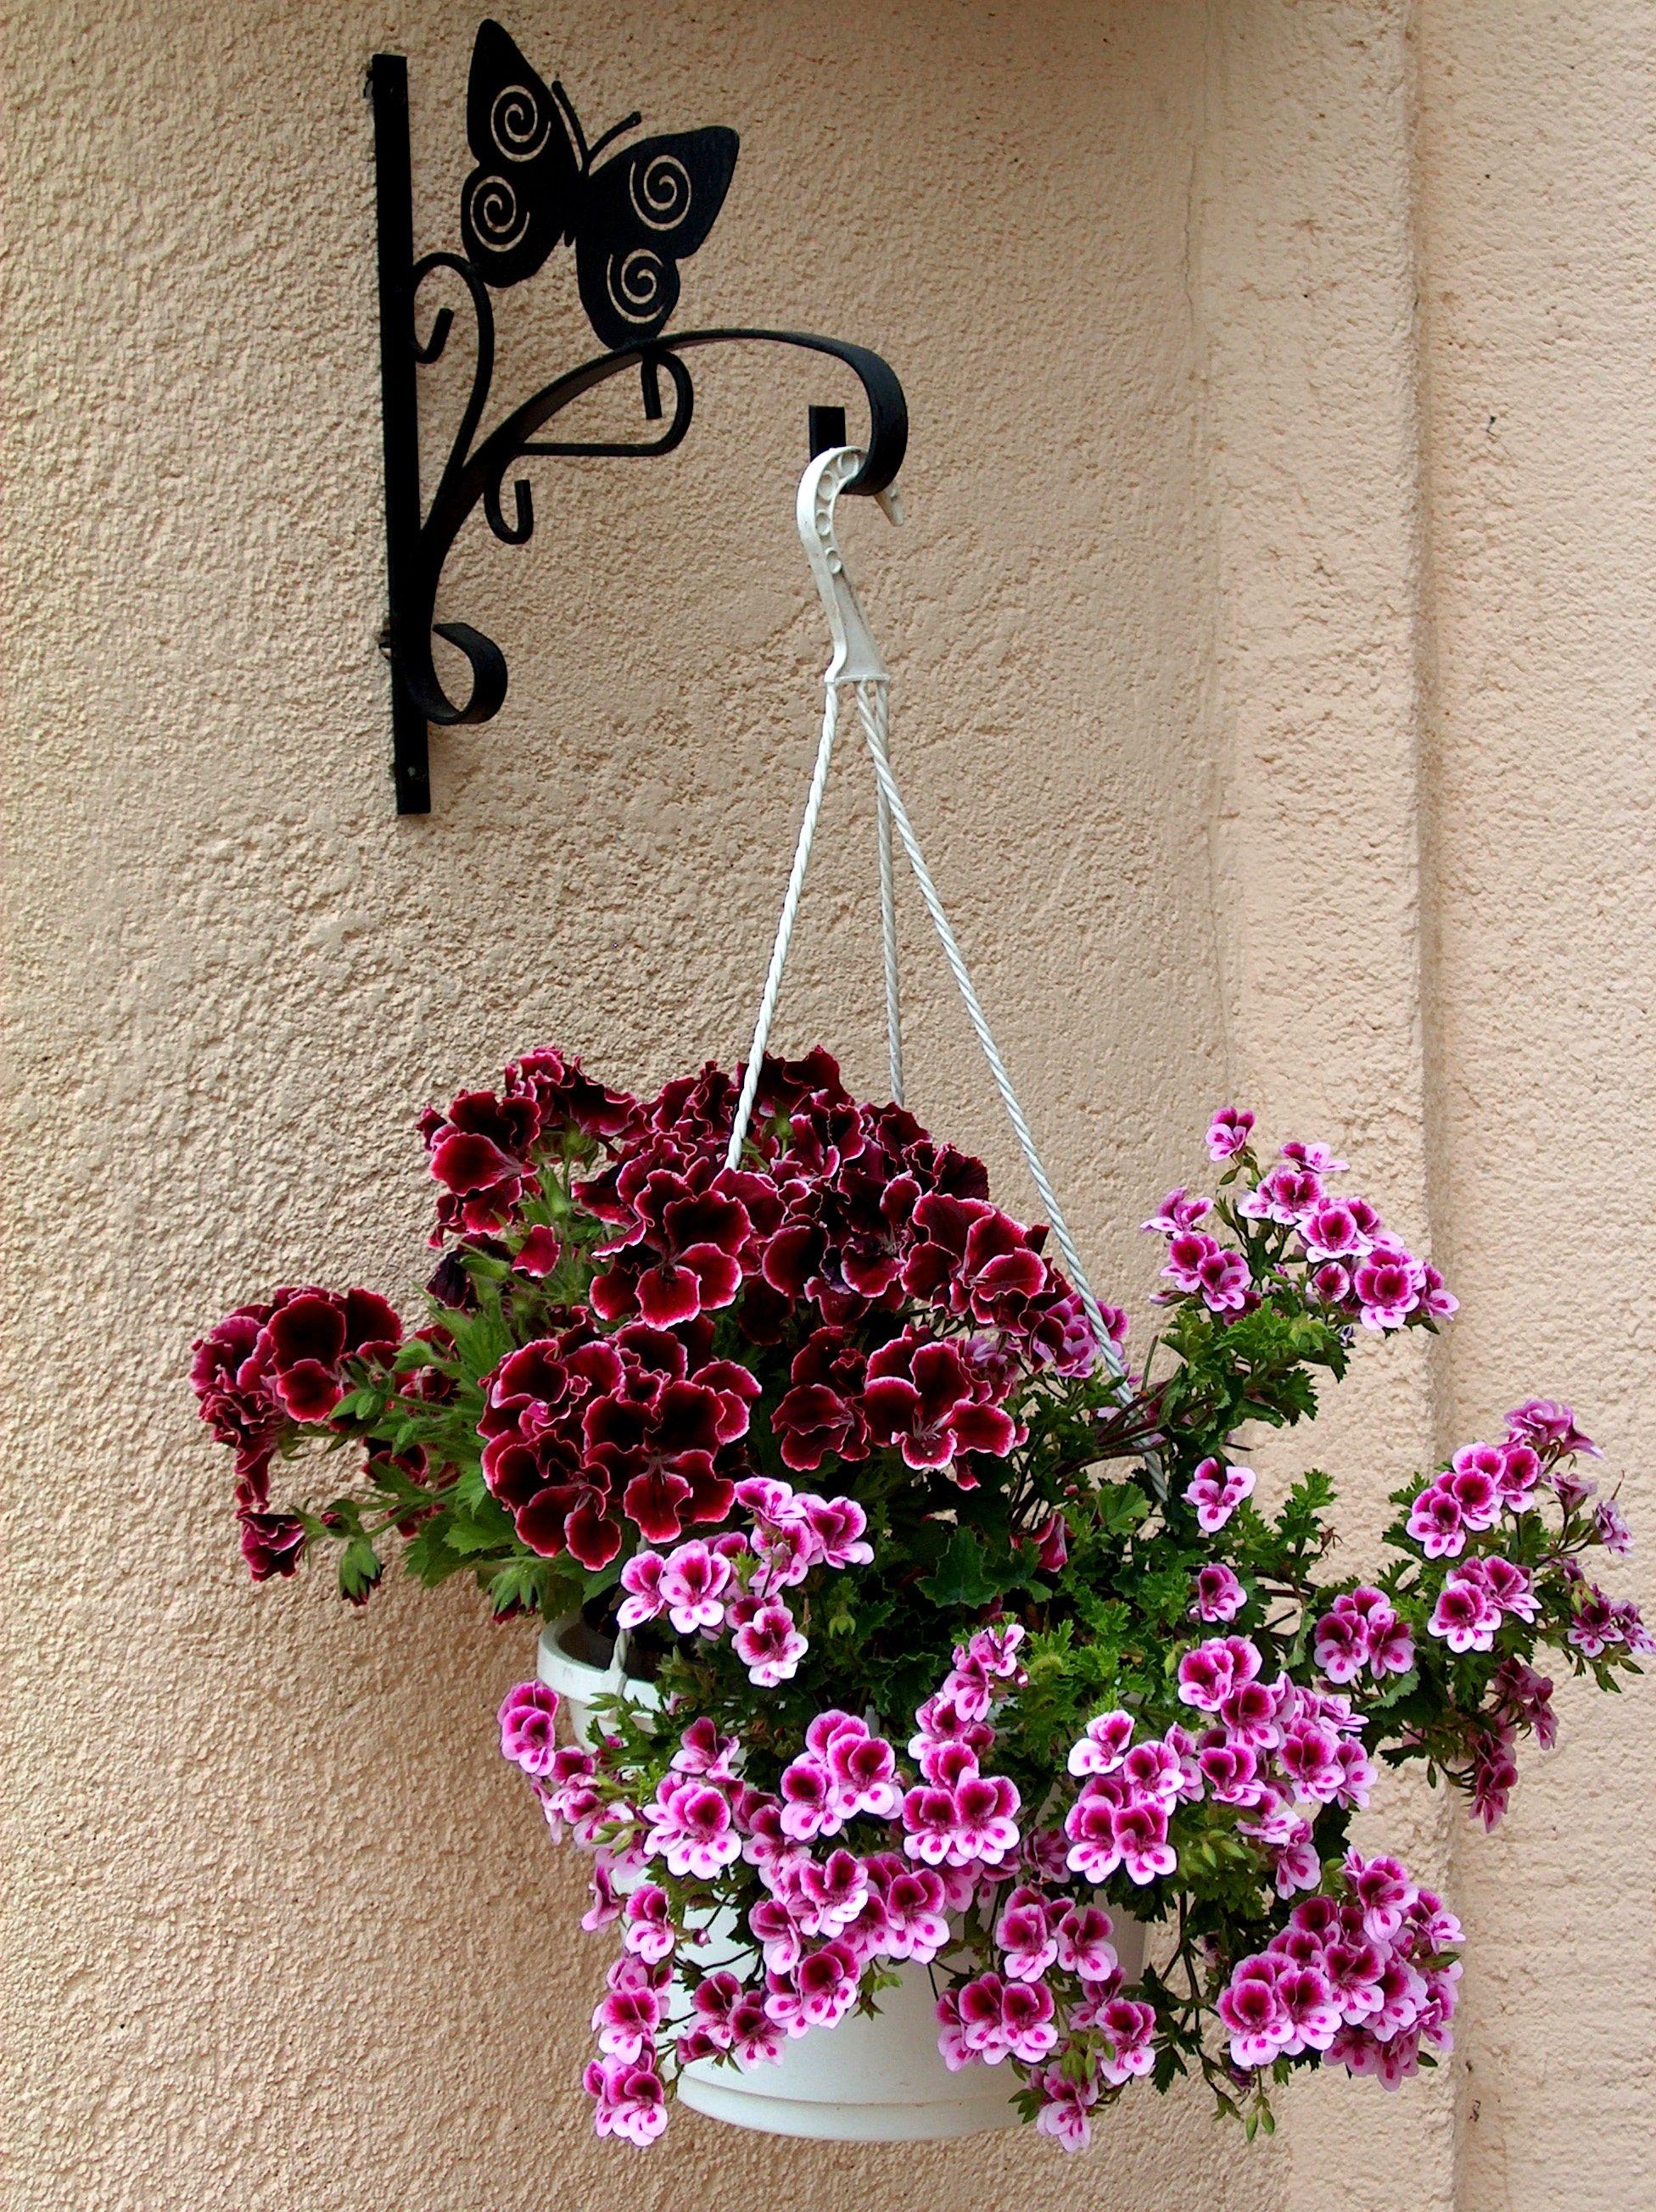 Fotos gratis naturaleza rama planta p rpura p talo for Diseno de plantas ornamentales